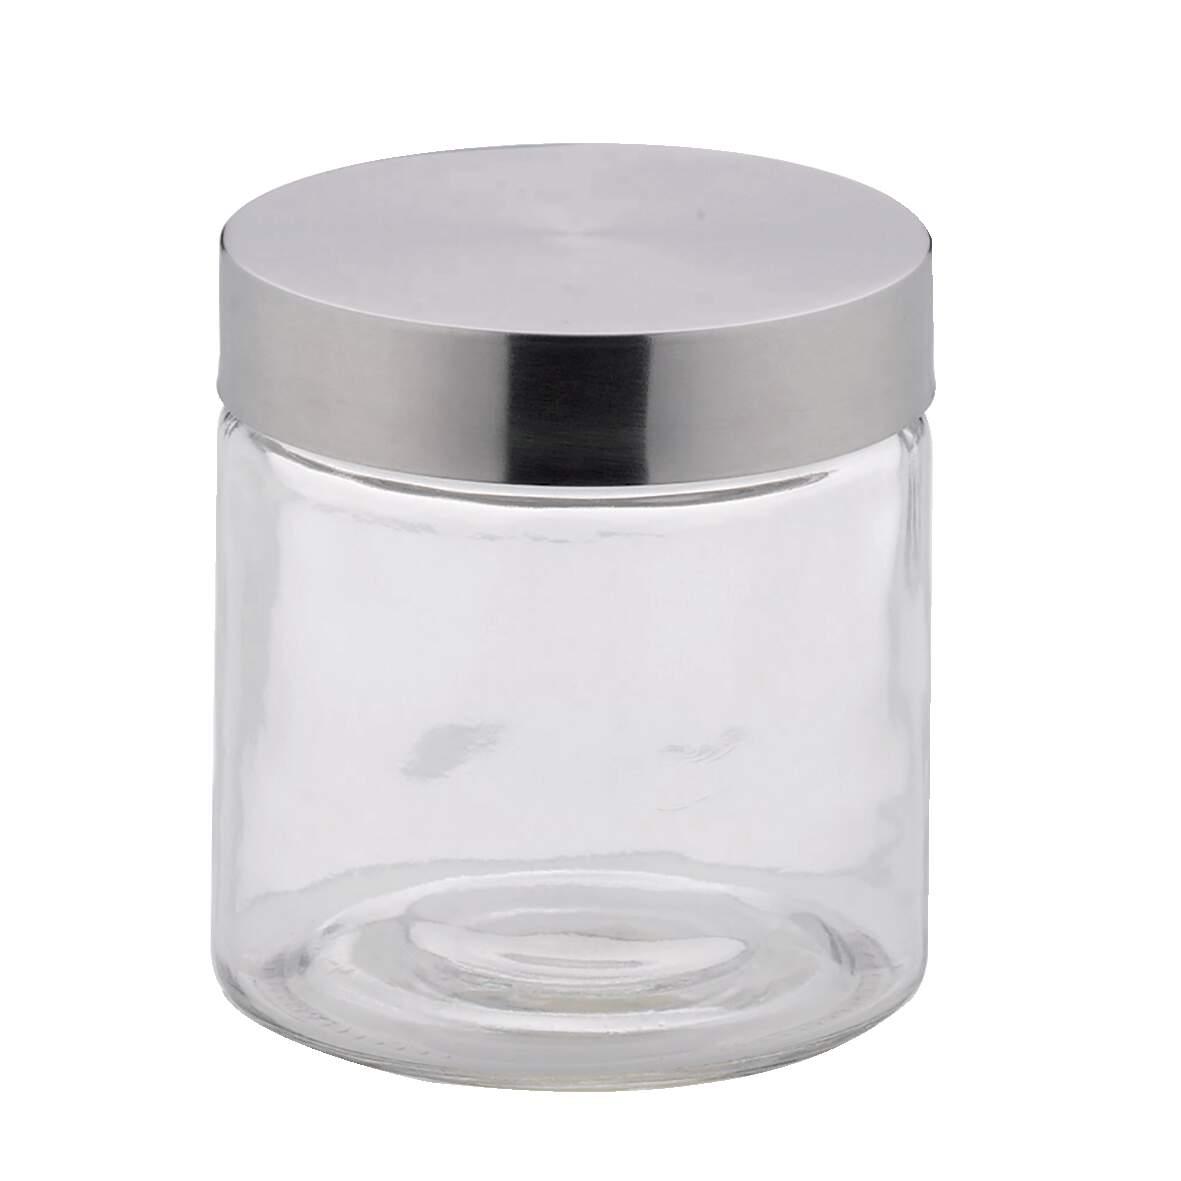 vorratsdose glas   vorratsdose glas mit rfs deckel 12 x 12 cm 12 12